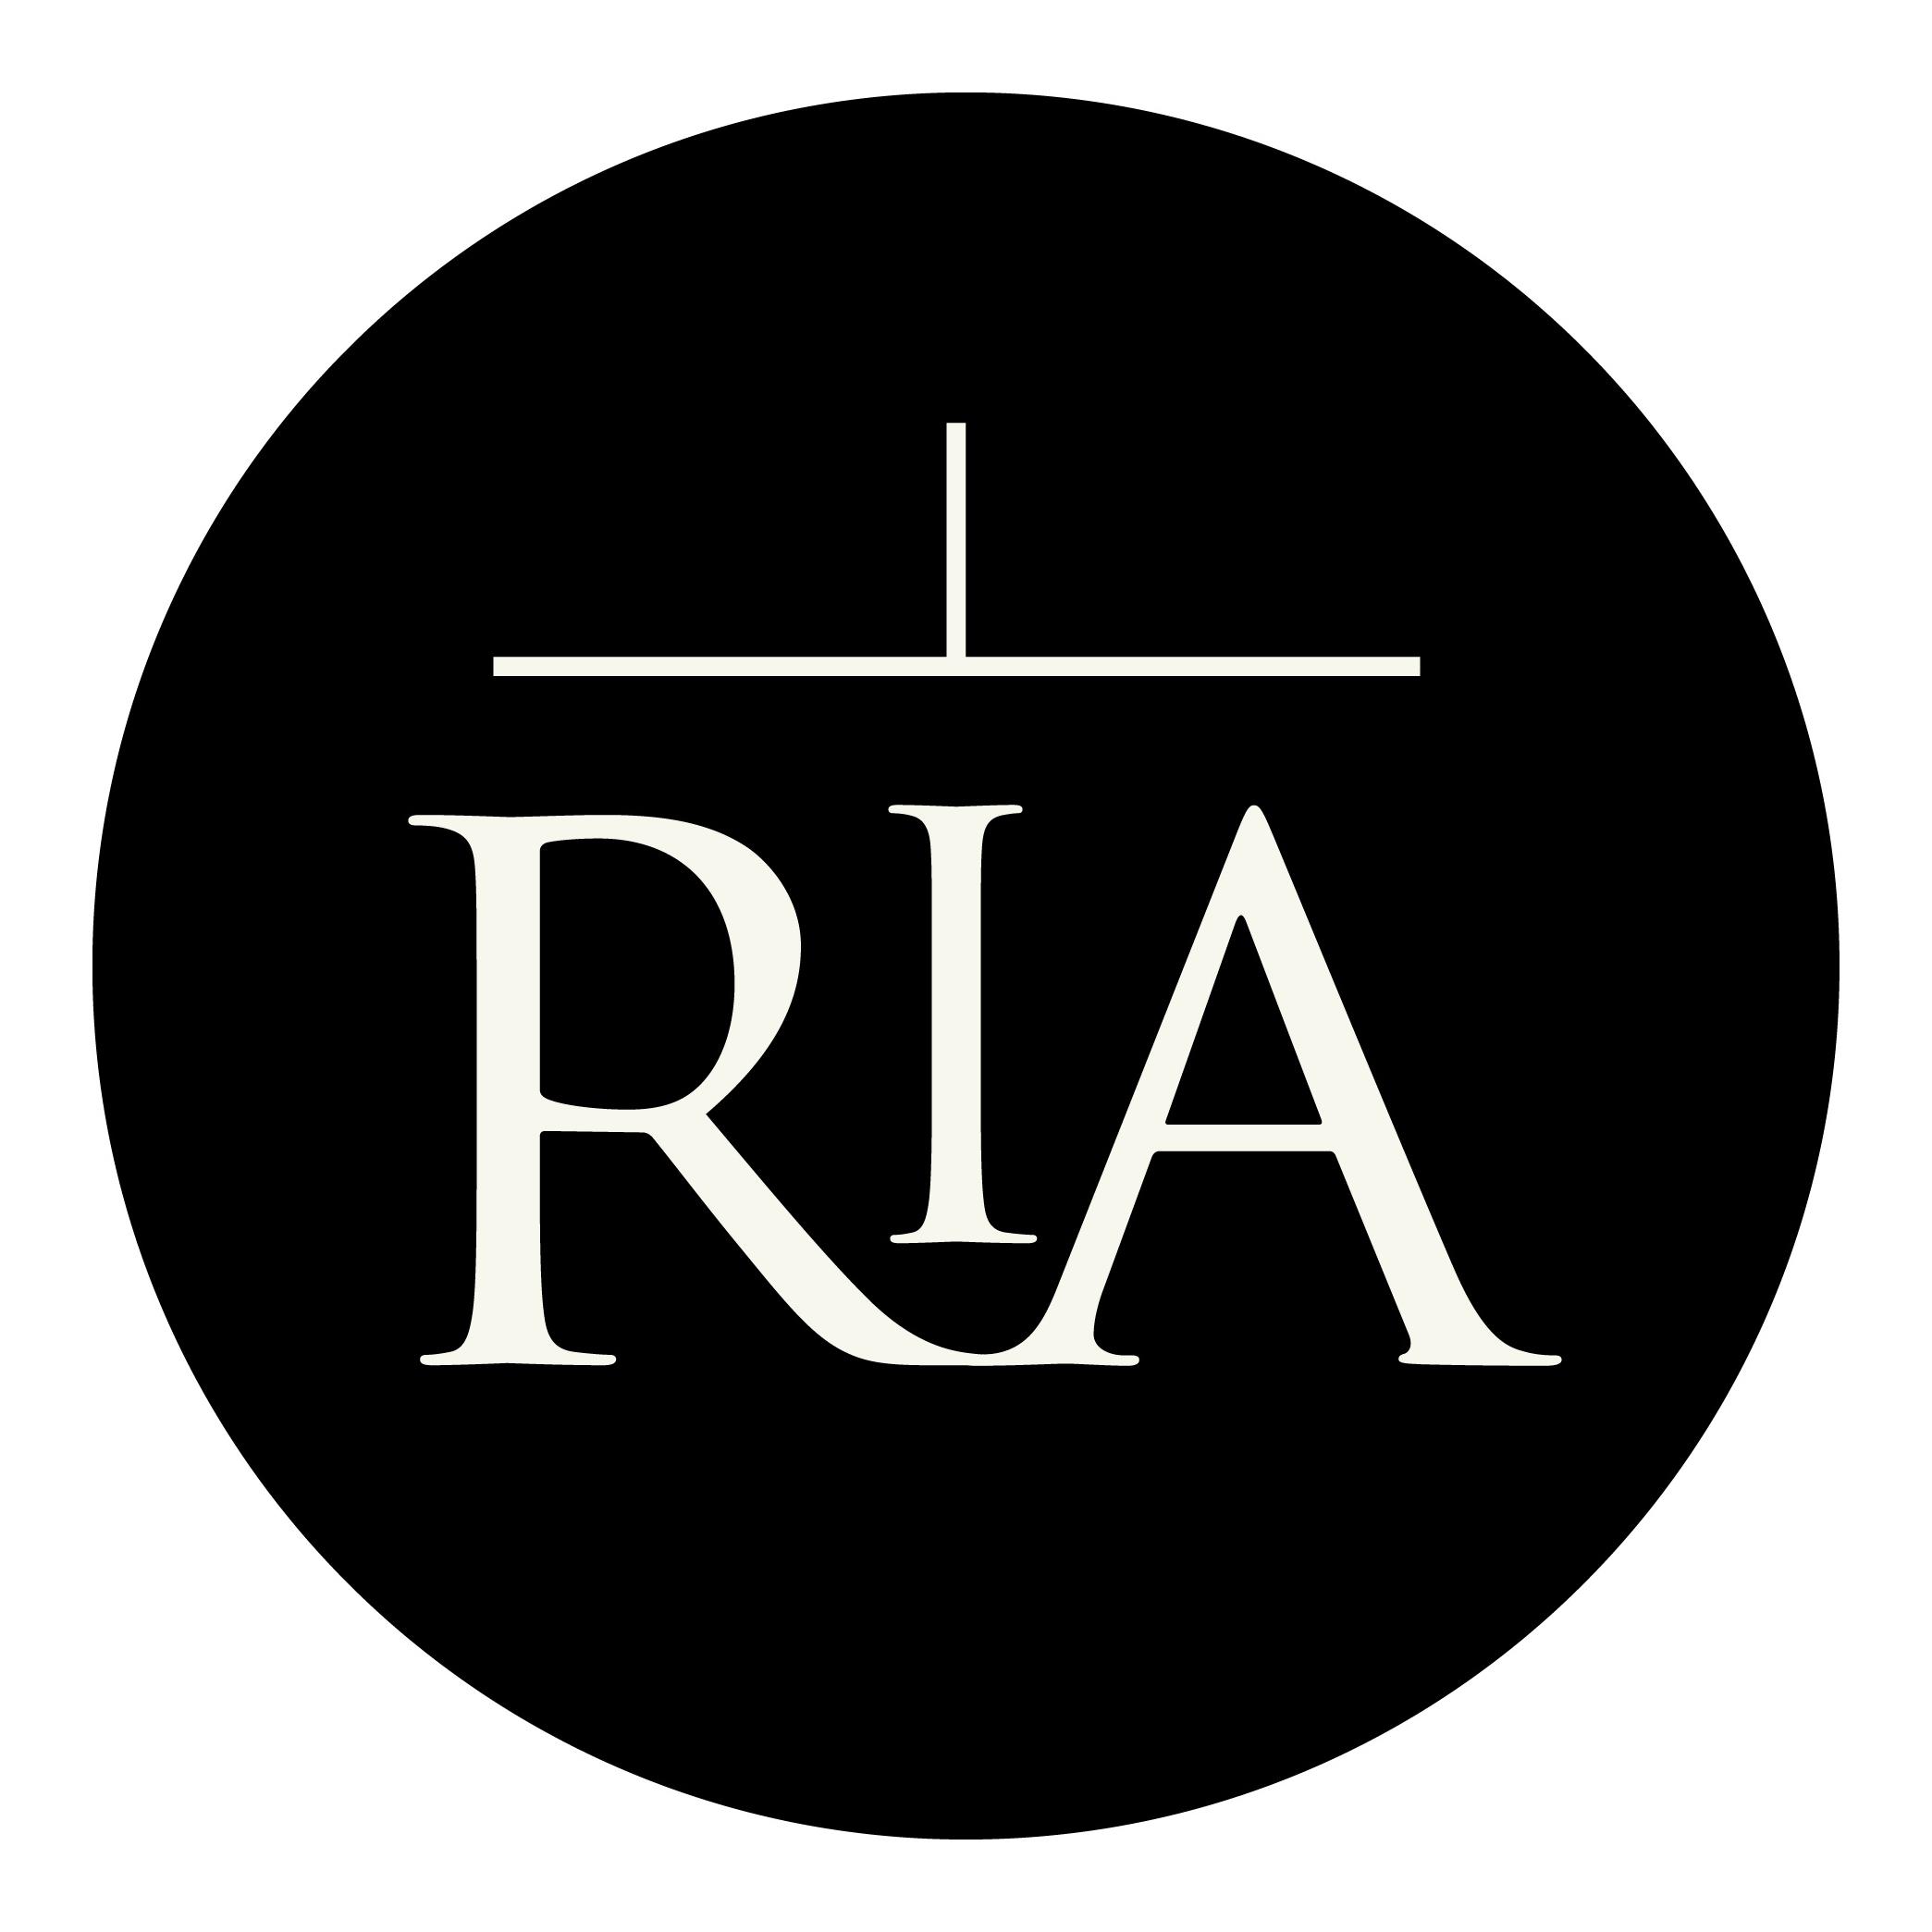 Royal Irish Academy